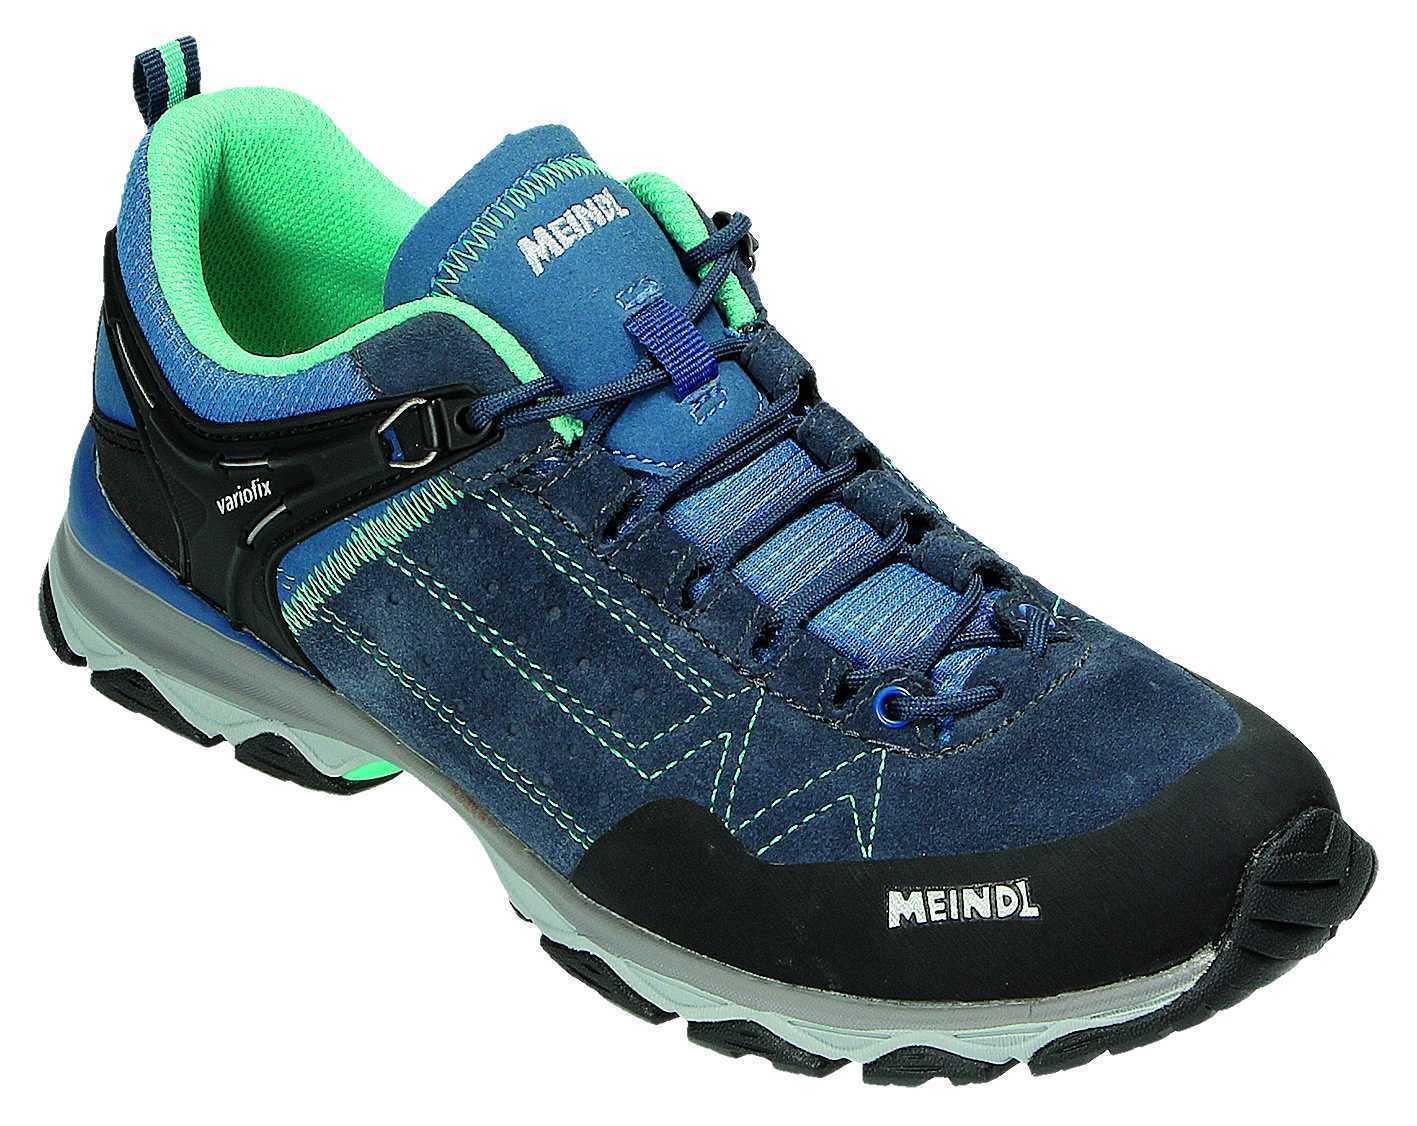 Meindl 3955-49 Ontario Ontario Ontario Lady outdoor con cordones walkingzapatos azul Gr. 36-43 neu5  comprar barato